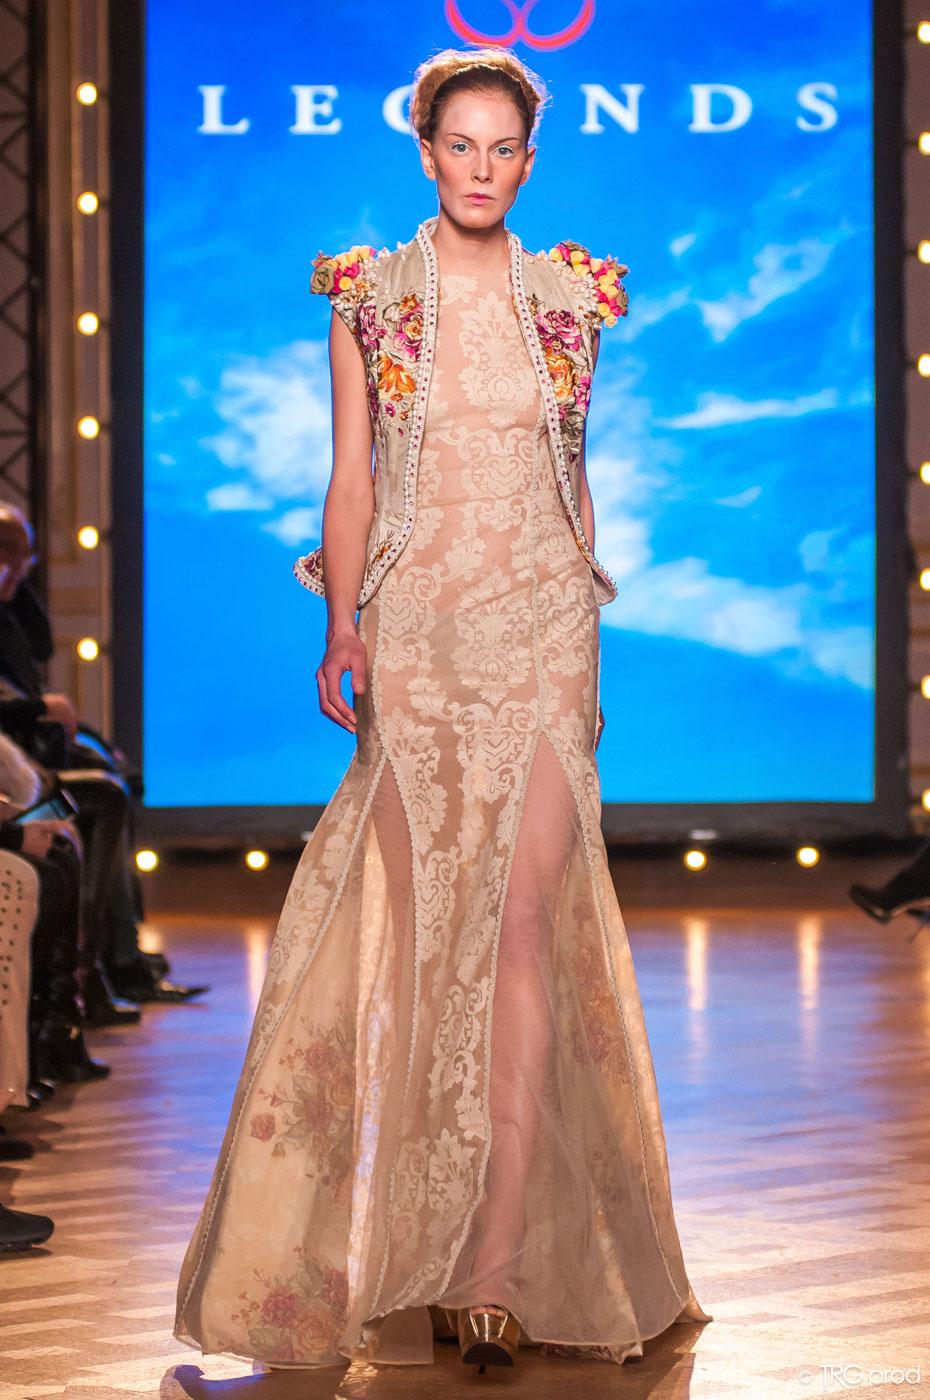 Legends-fashion-runway-show-haute-couture-paris-spring-2015-the-impression-16